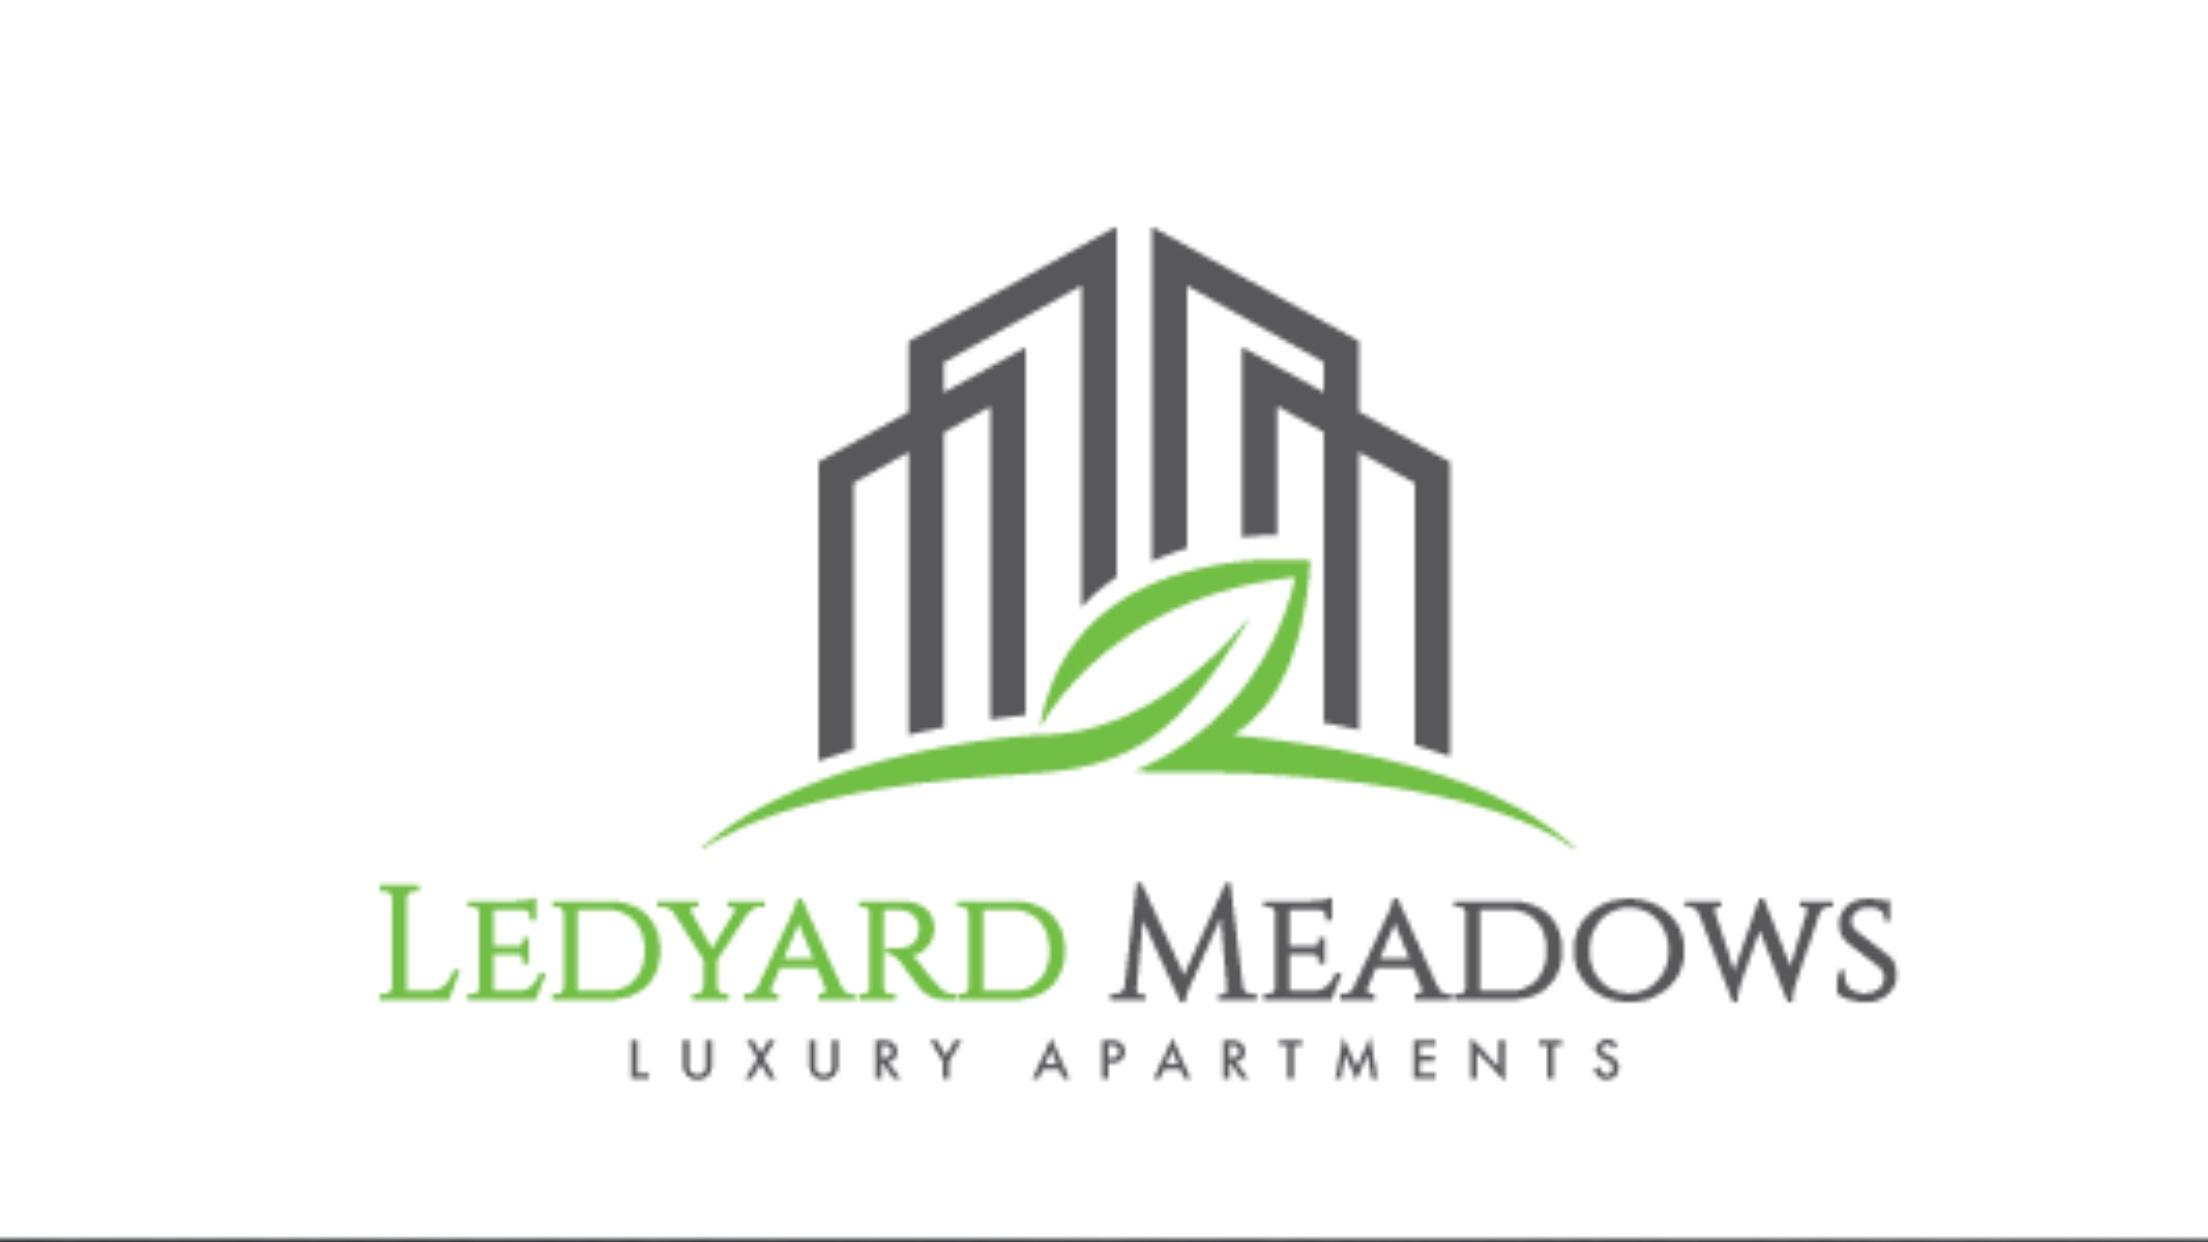 Ledyard Meadows Luxury Apartments